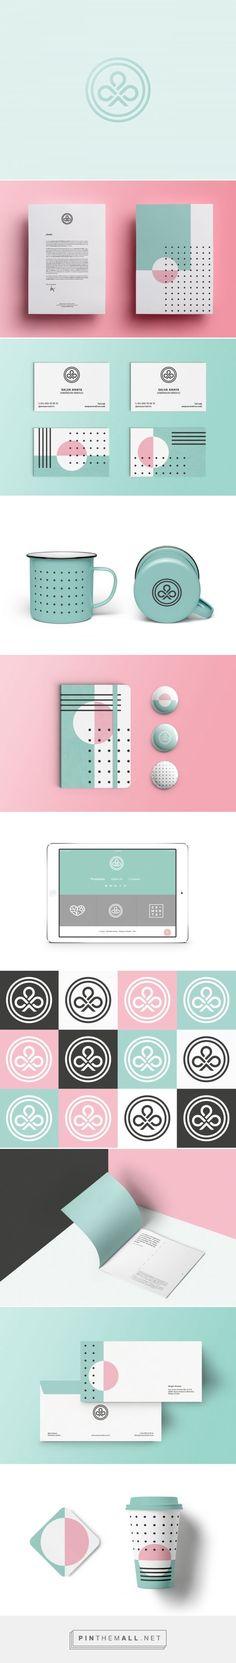 Anaya Creativo Personal Branding by Salva Anaya | Fivestar Branding Agency – Design and Branding Agency & Curated Inspiration Gallery